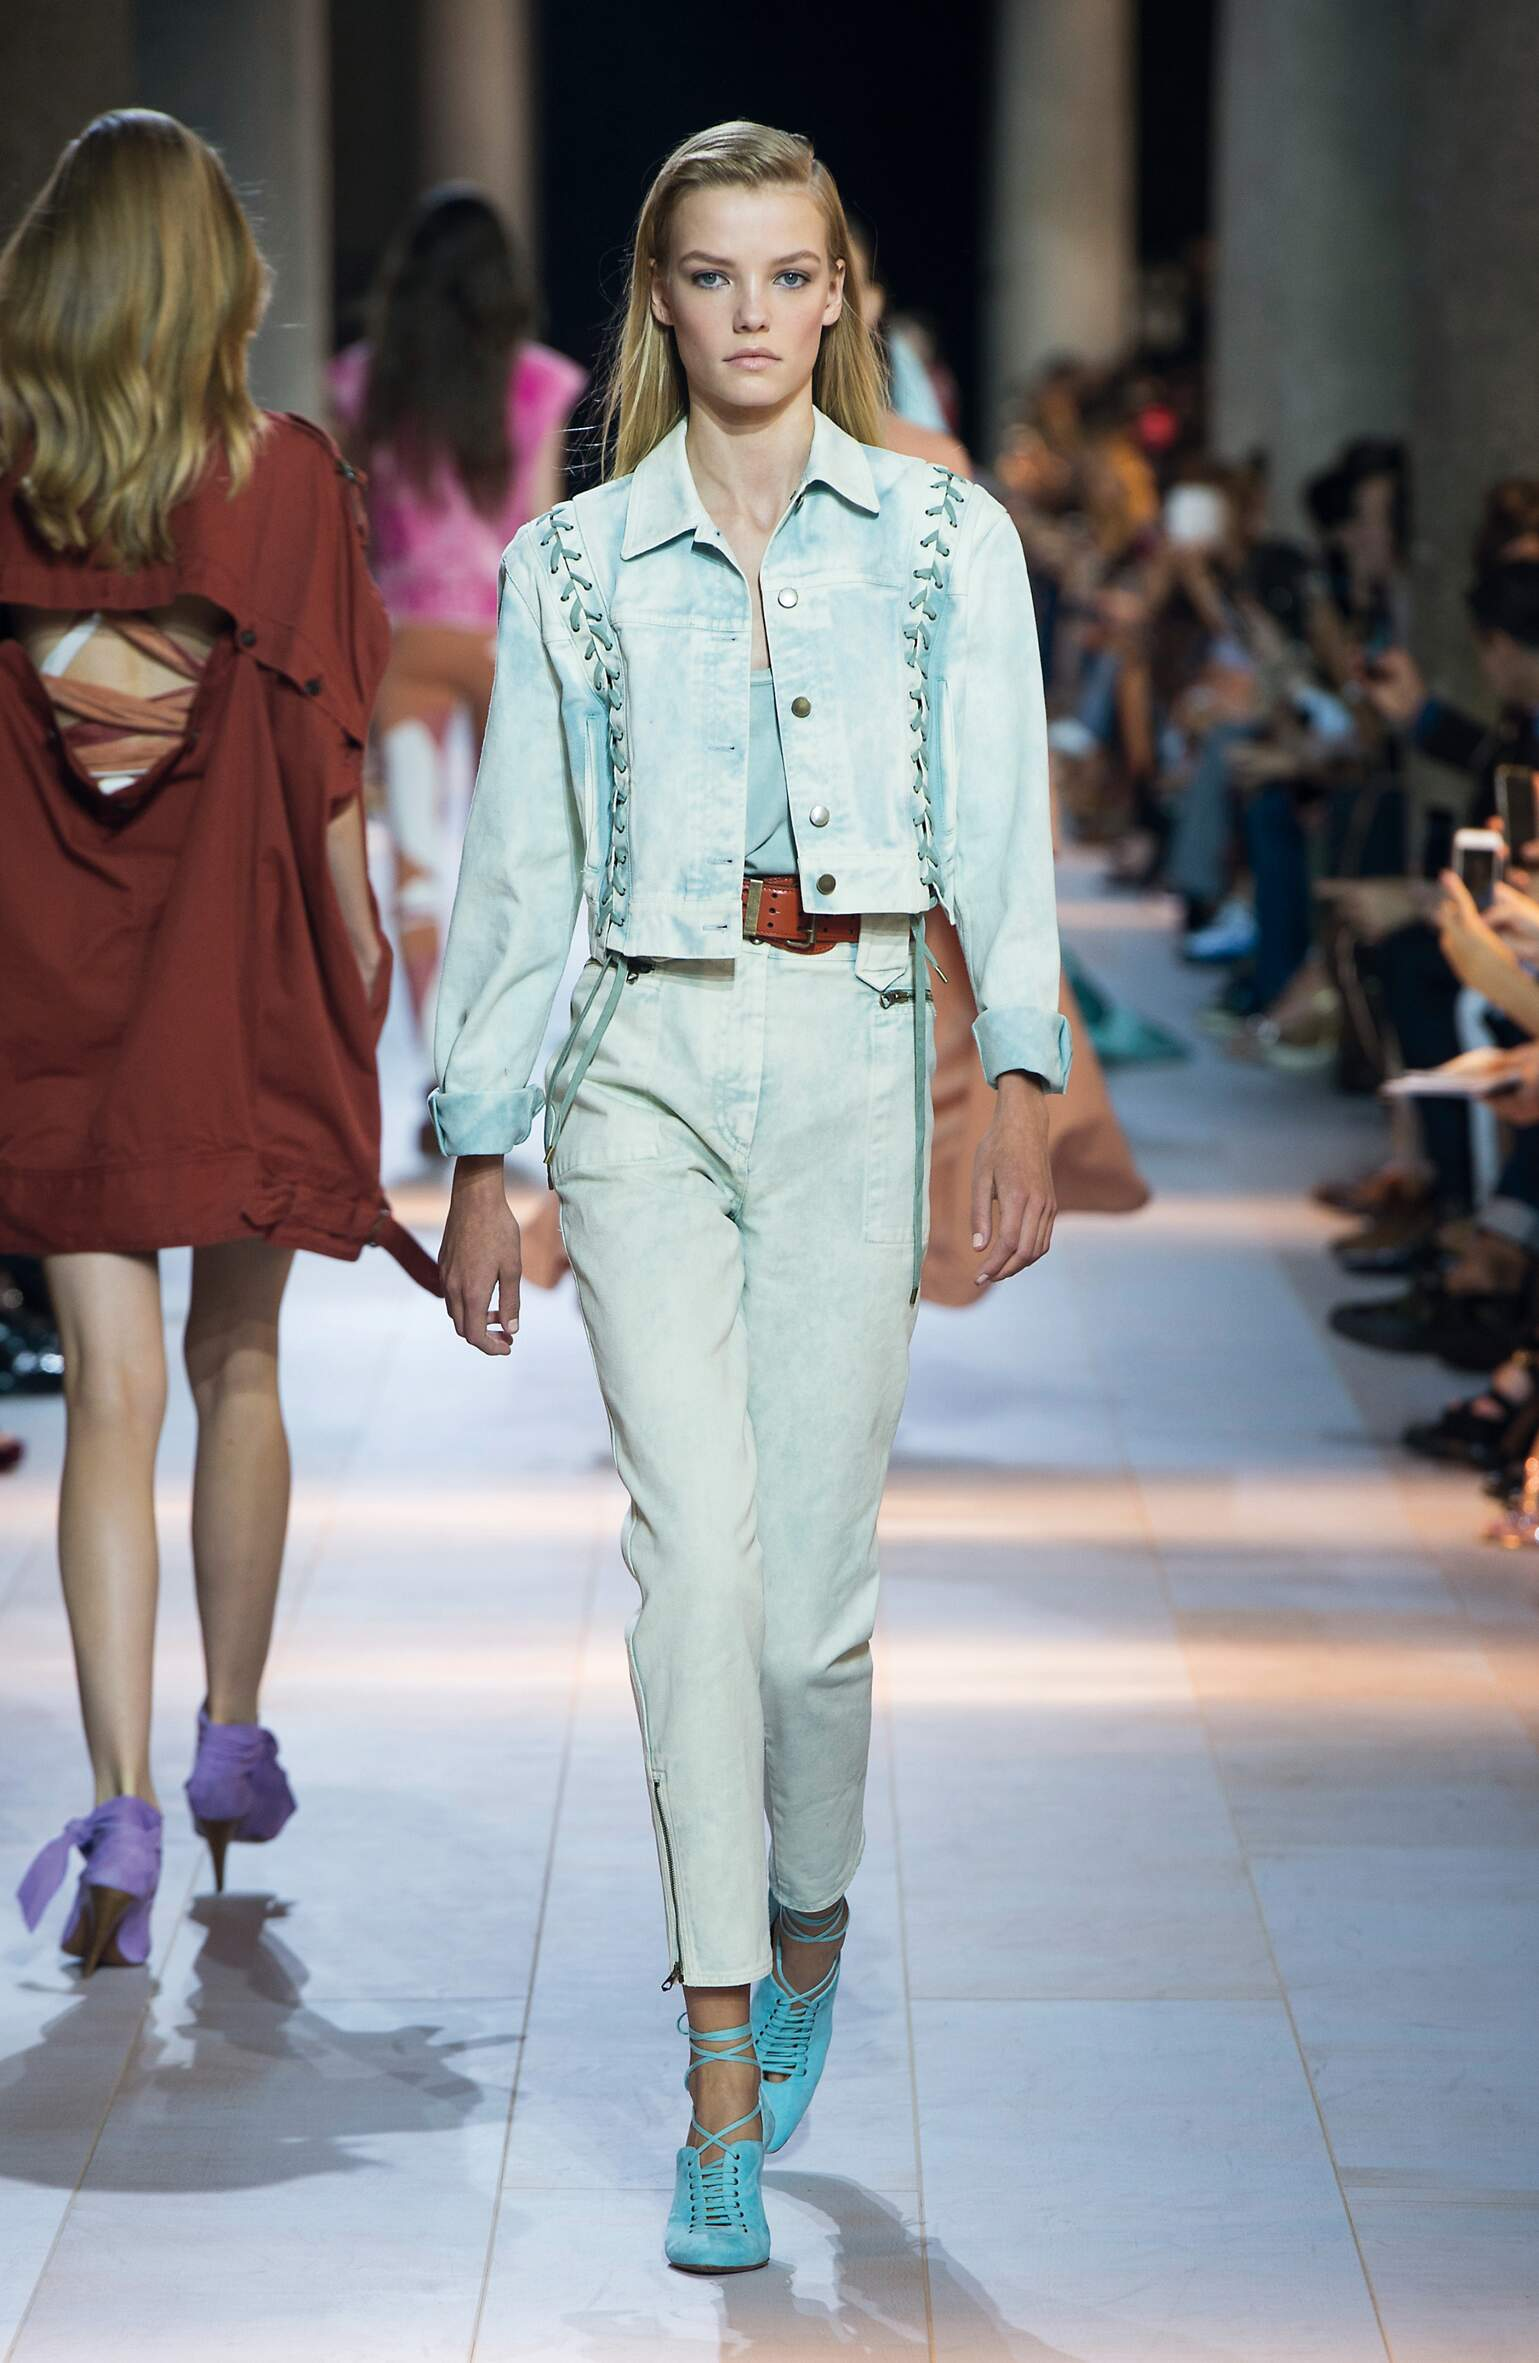 Models Fashion Show Roberto Cavalli